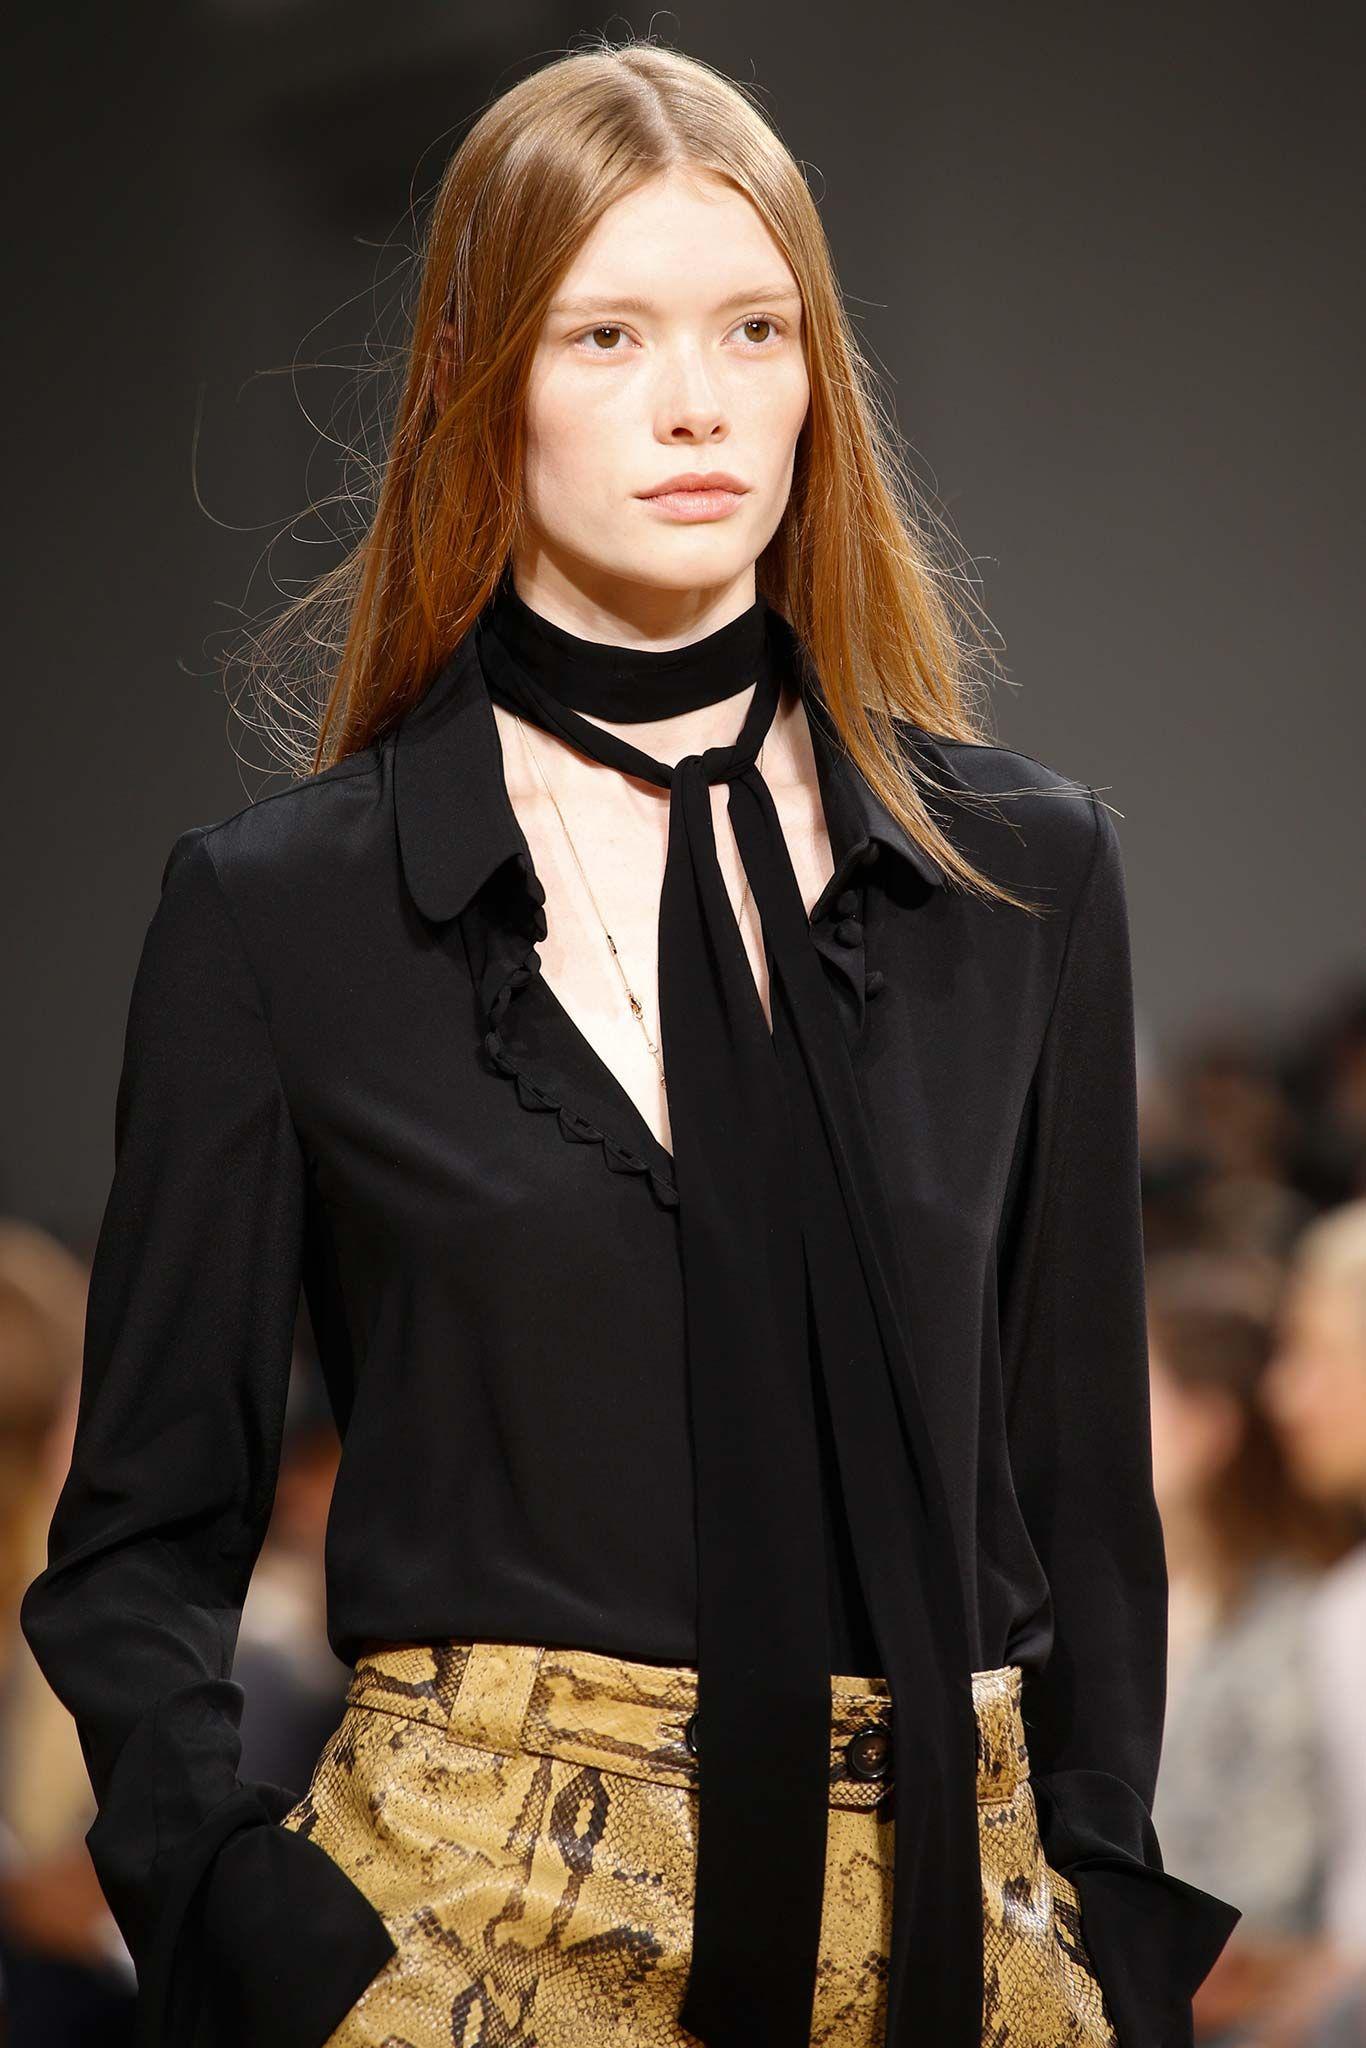 Chloé - Fall 2015 Ready-to-Wear - #womenswear #runway #paris #winter #pfw #catwalk